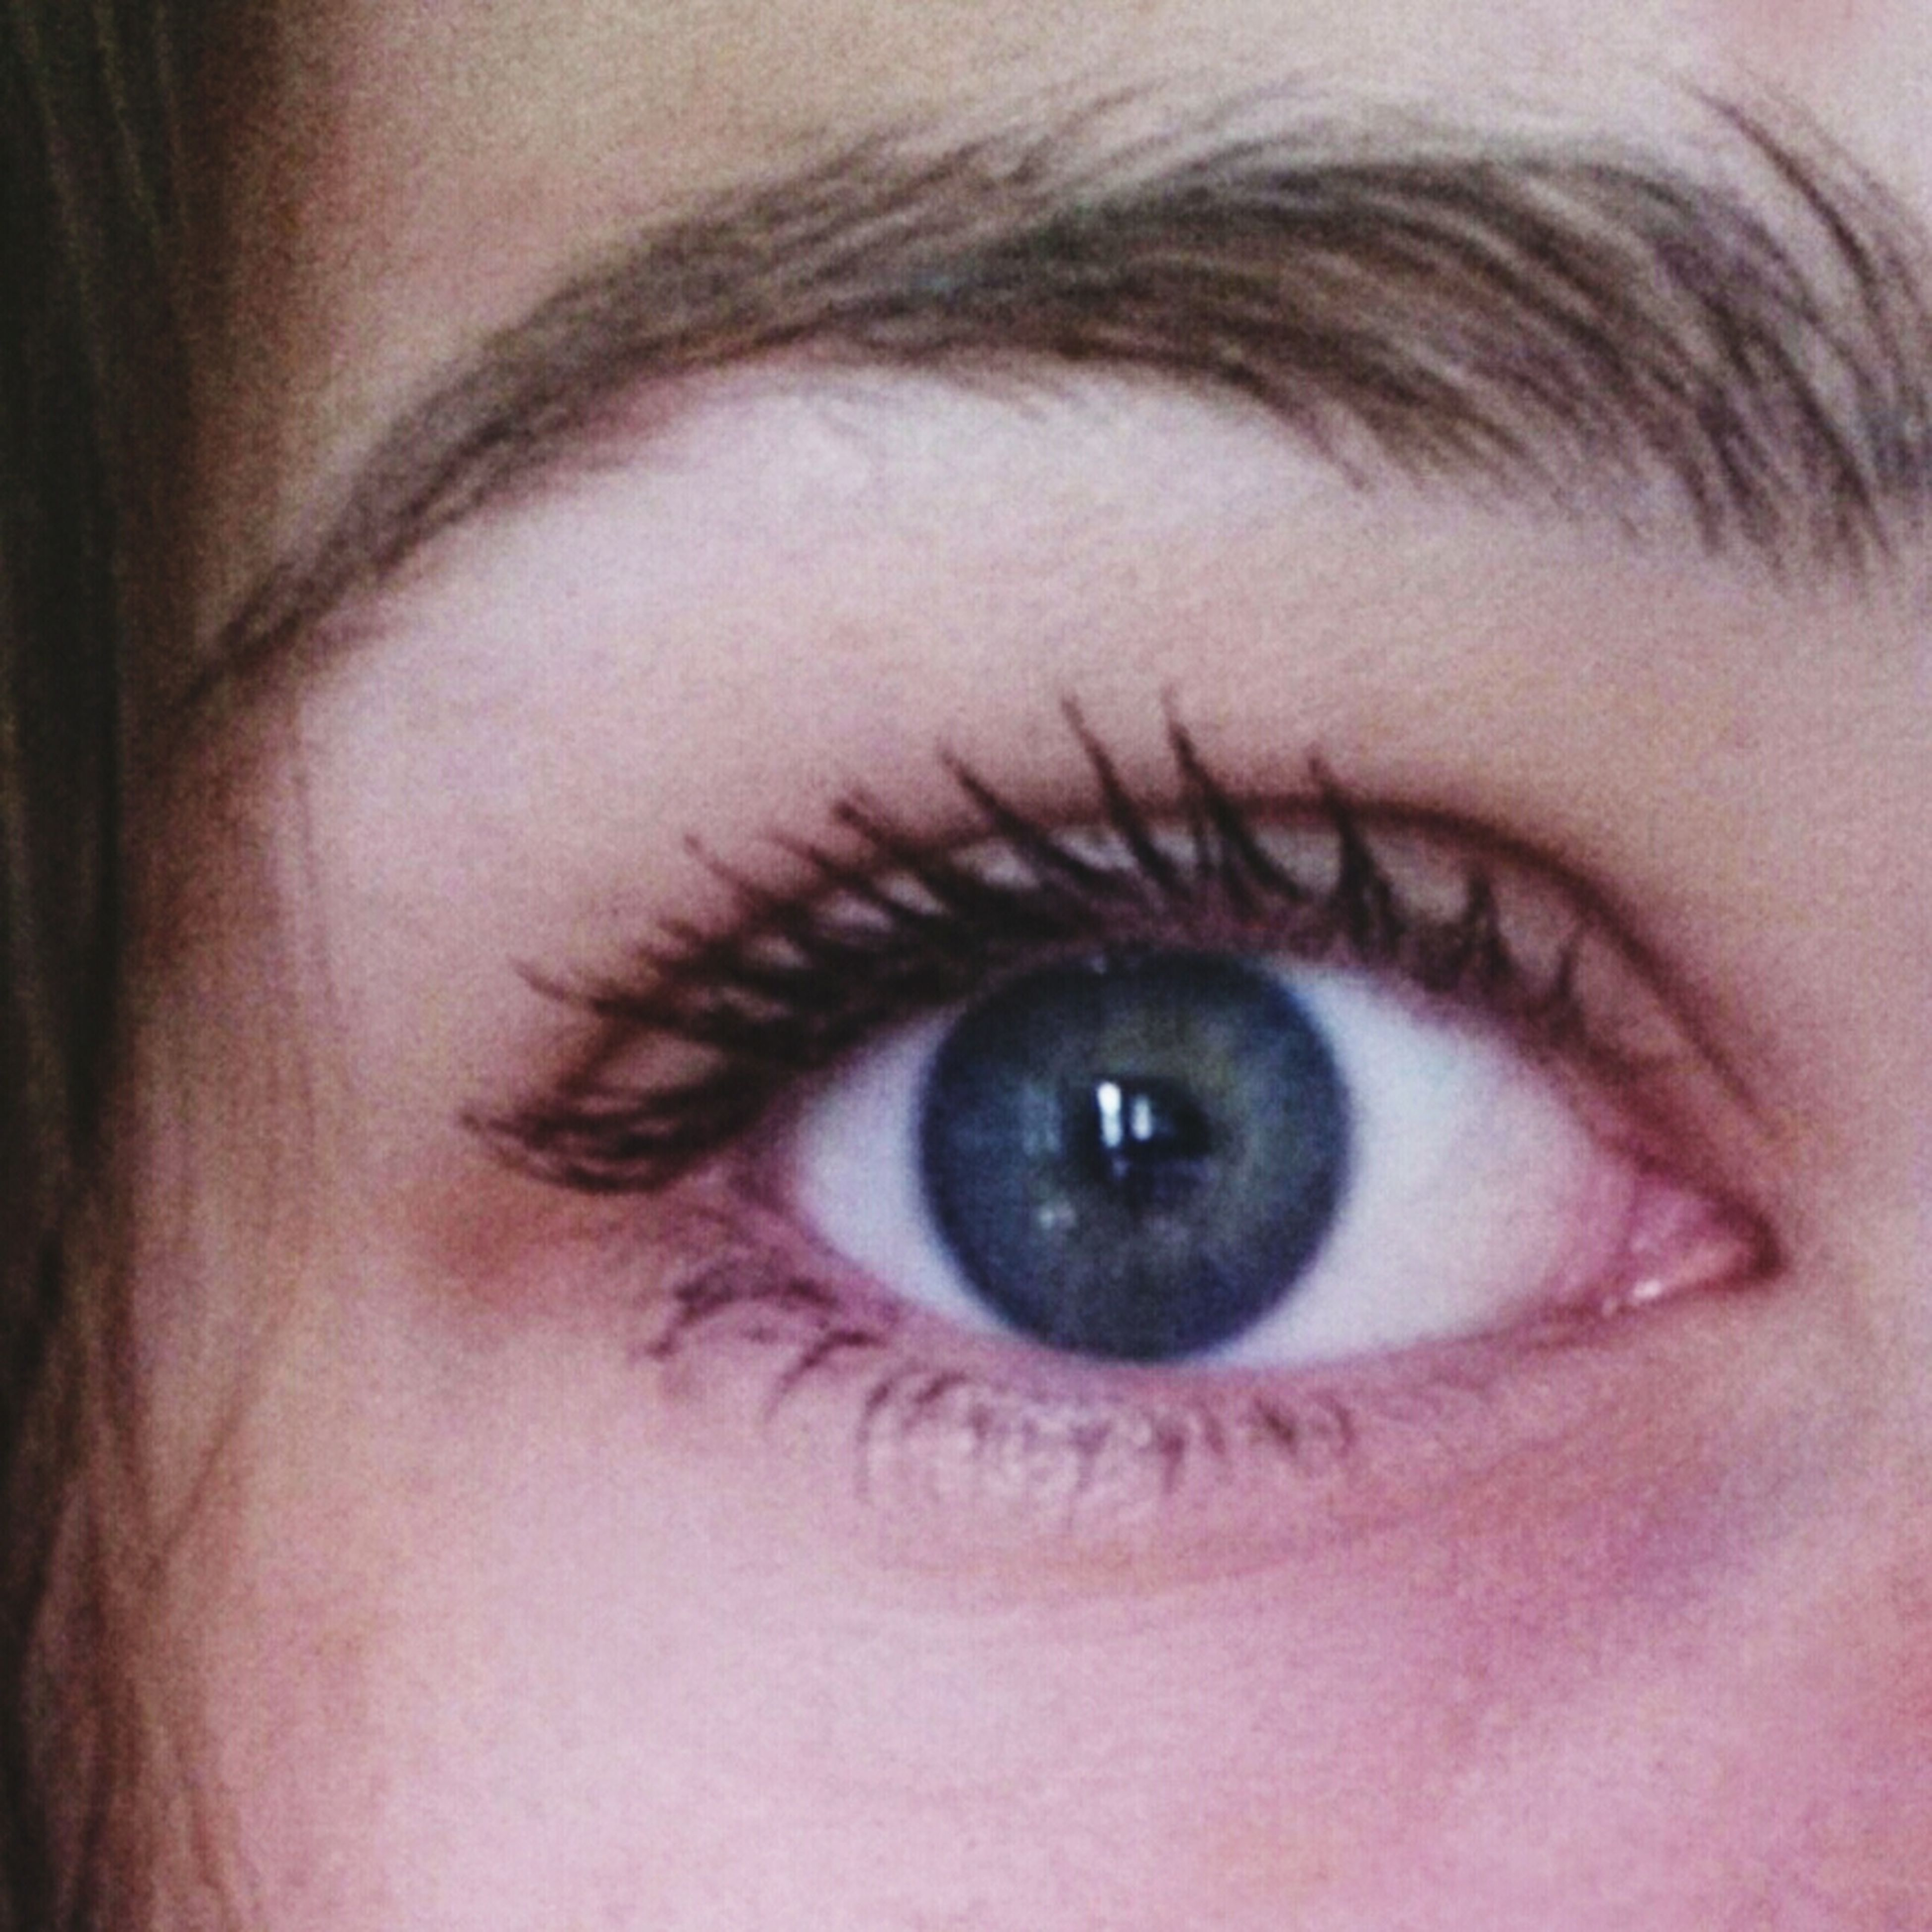 human eye, eyelash, close-up, eyesight, human face, looking at camera, part of, human skin, sensory perception, lifestyles, iris - eye, portrait, eyeball, eyebrow, headshot, person, indoors